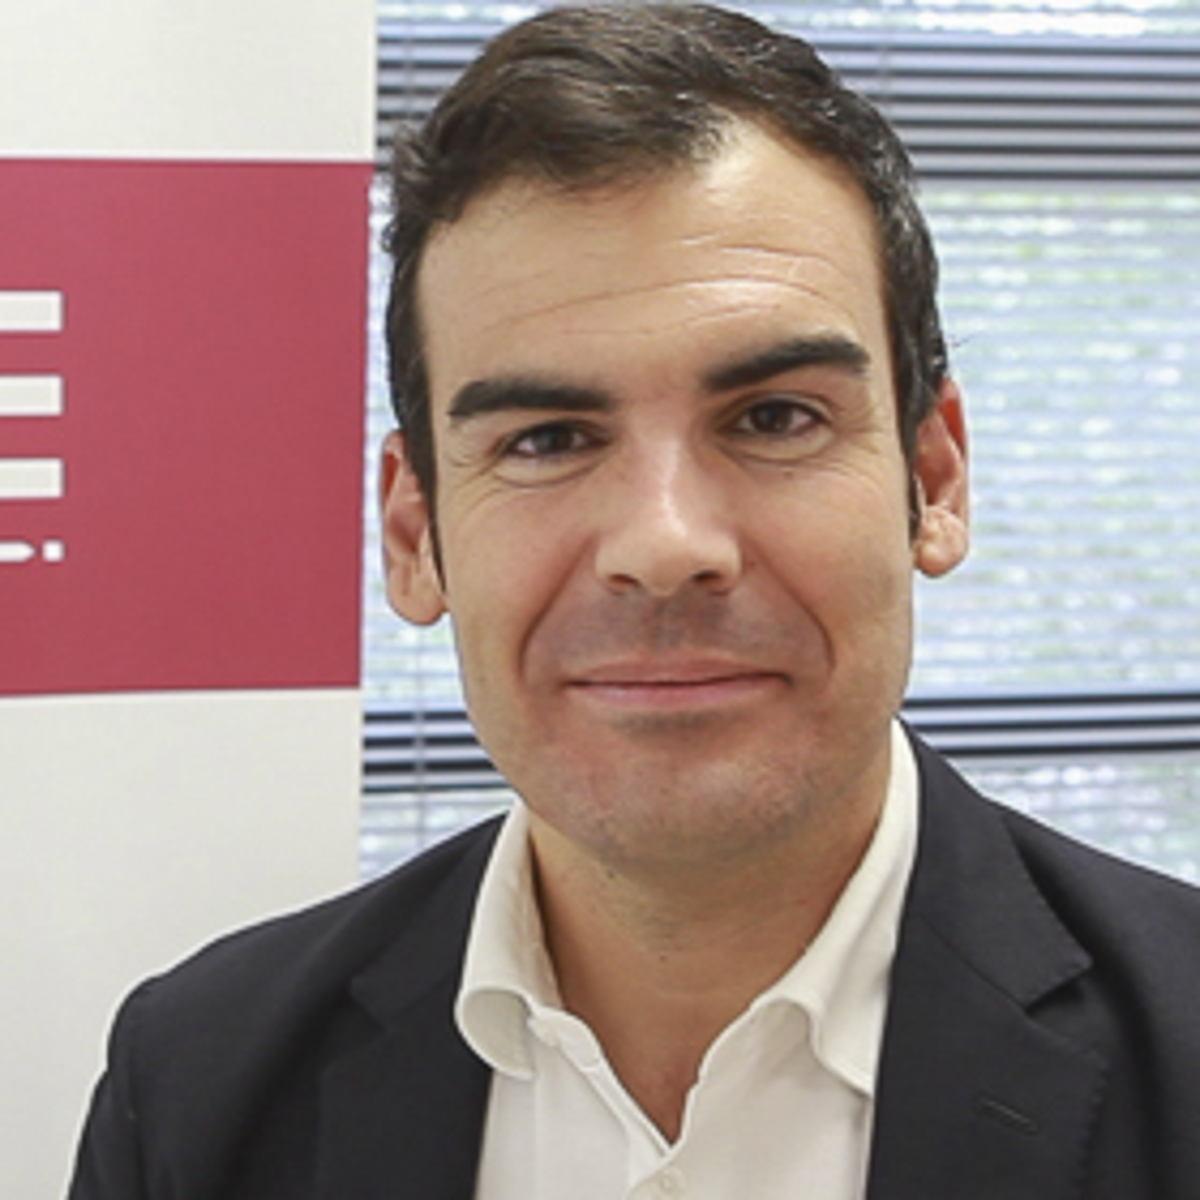 Álvaro Olivares Galera - Executive MBA